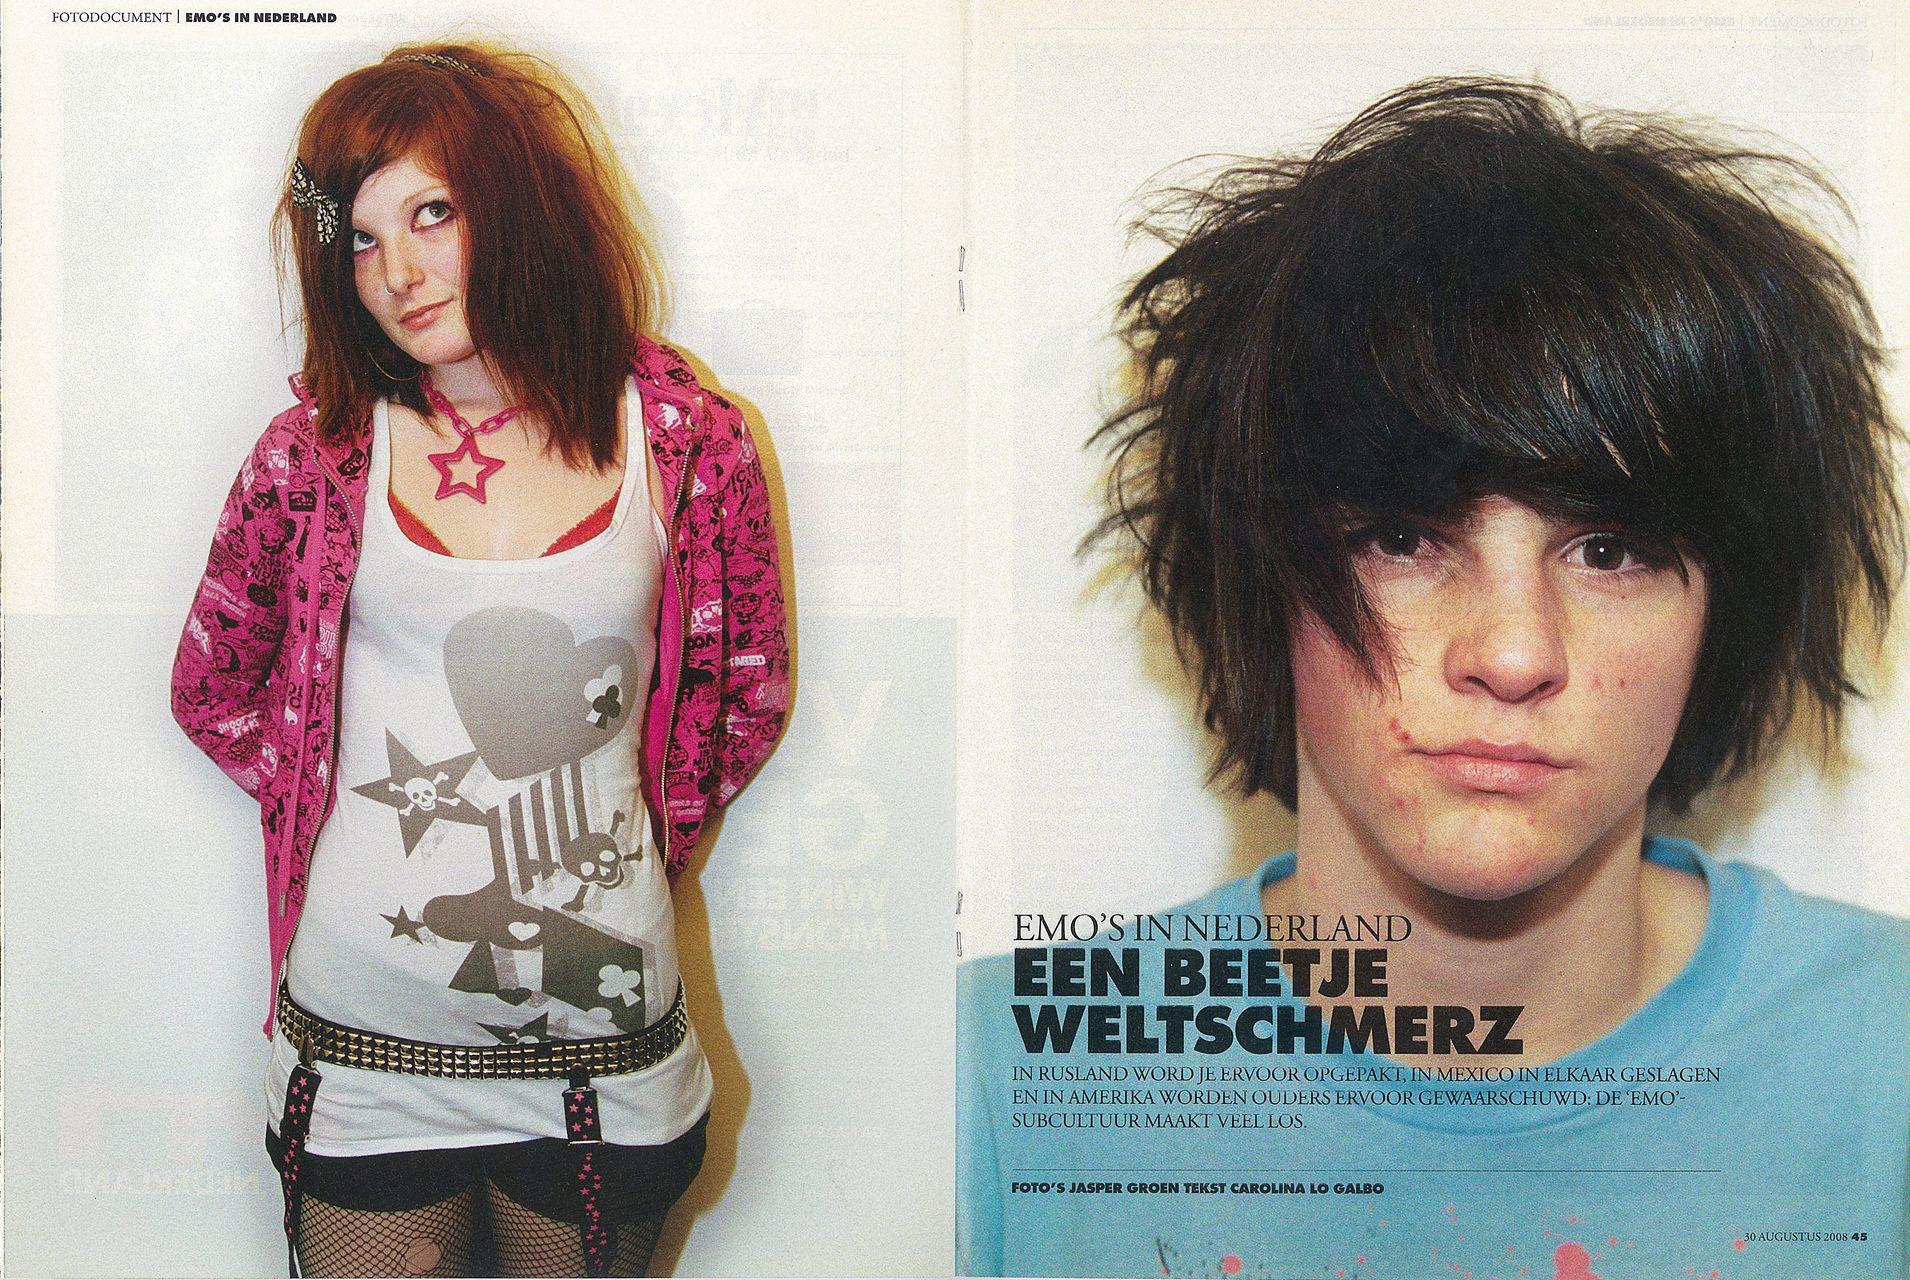 August 2008: publication in Vrij Nederland, 8 pages.